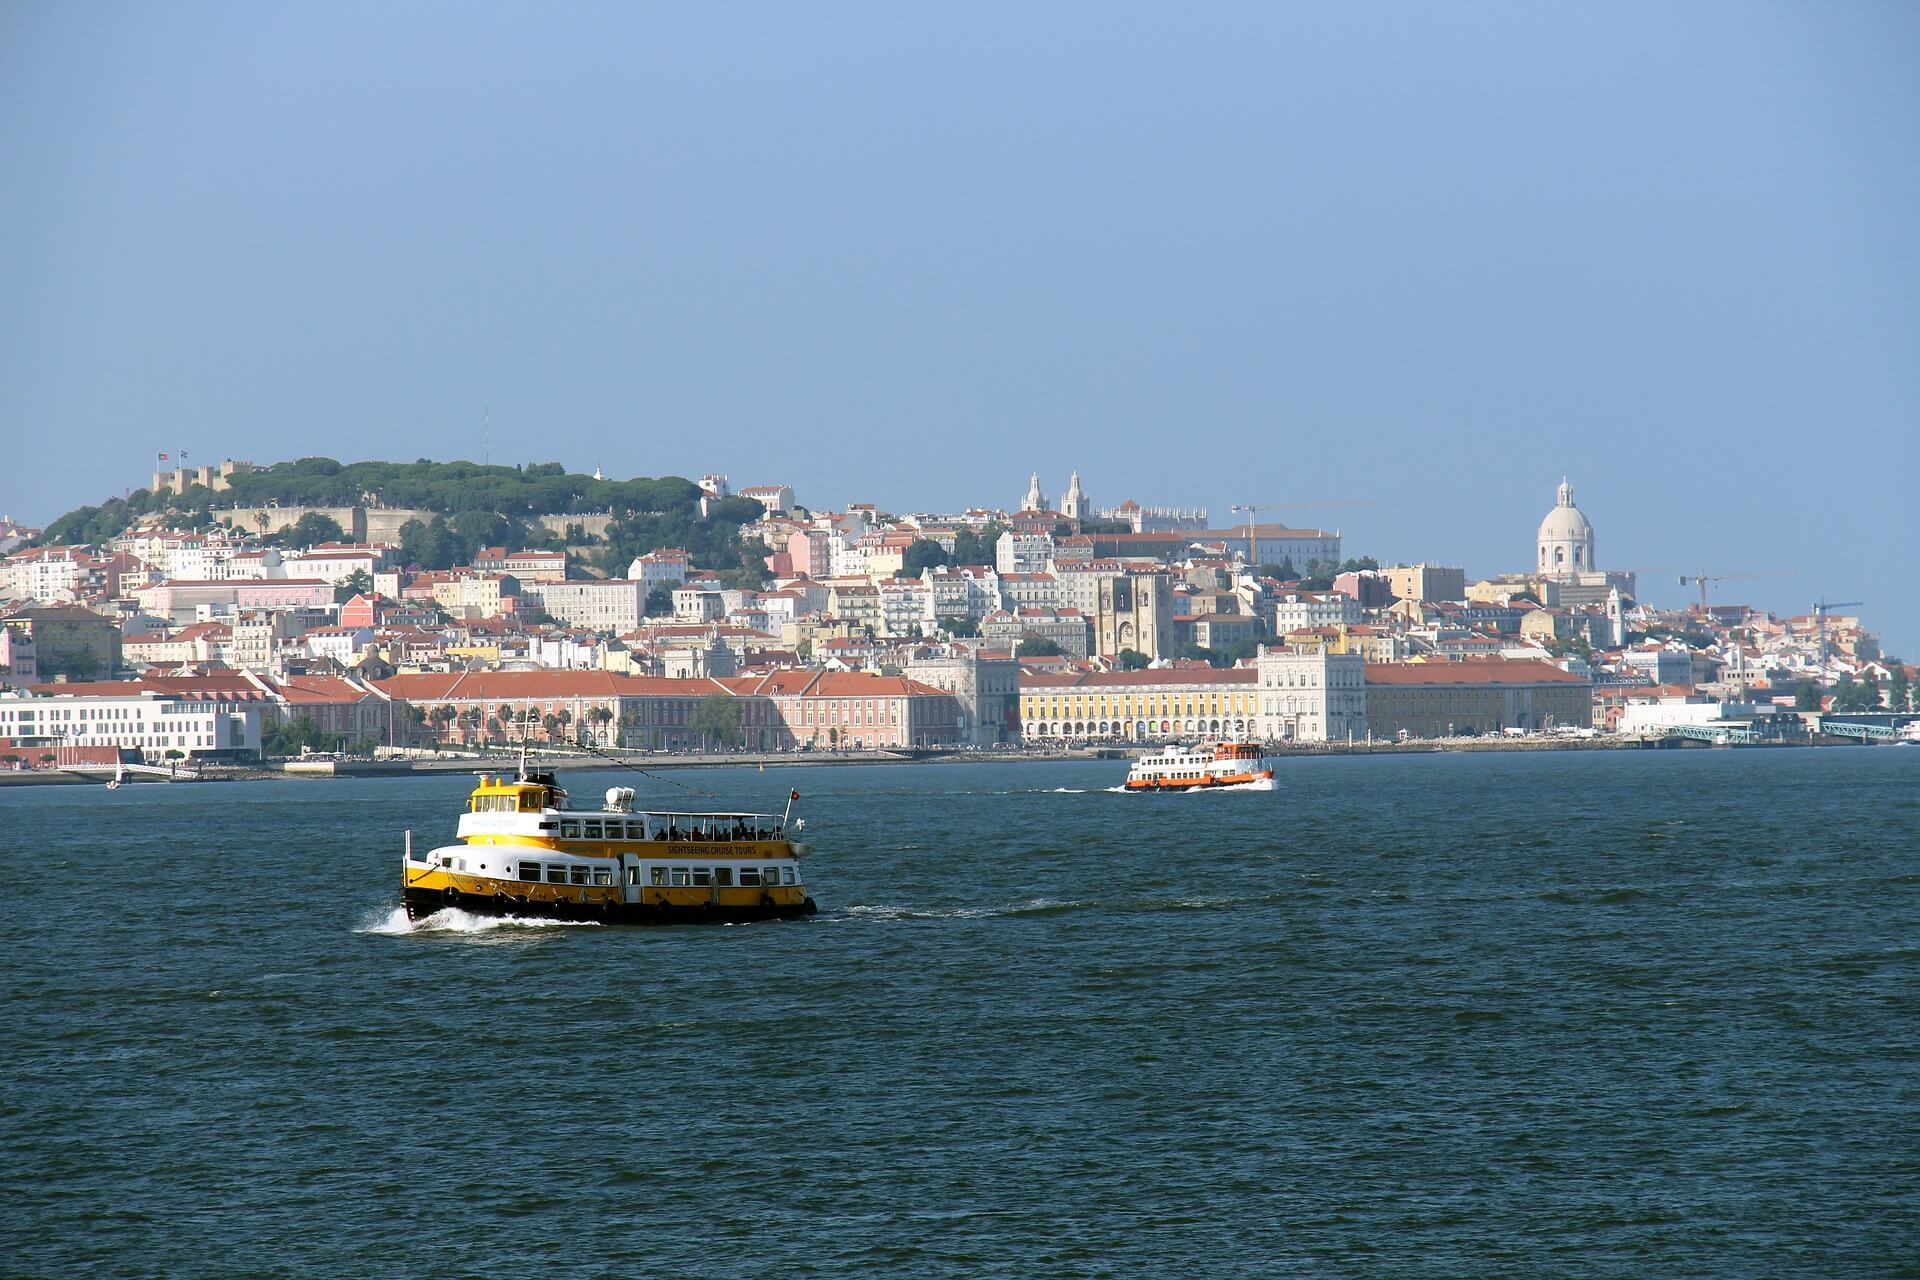 Tagus River Boat Cruise, Lisbon